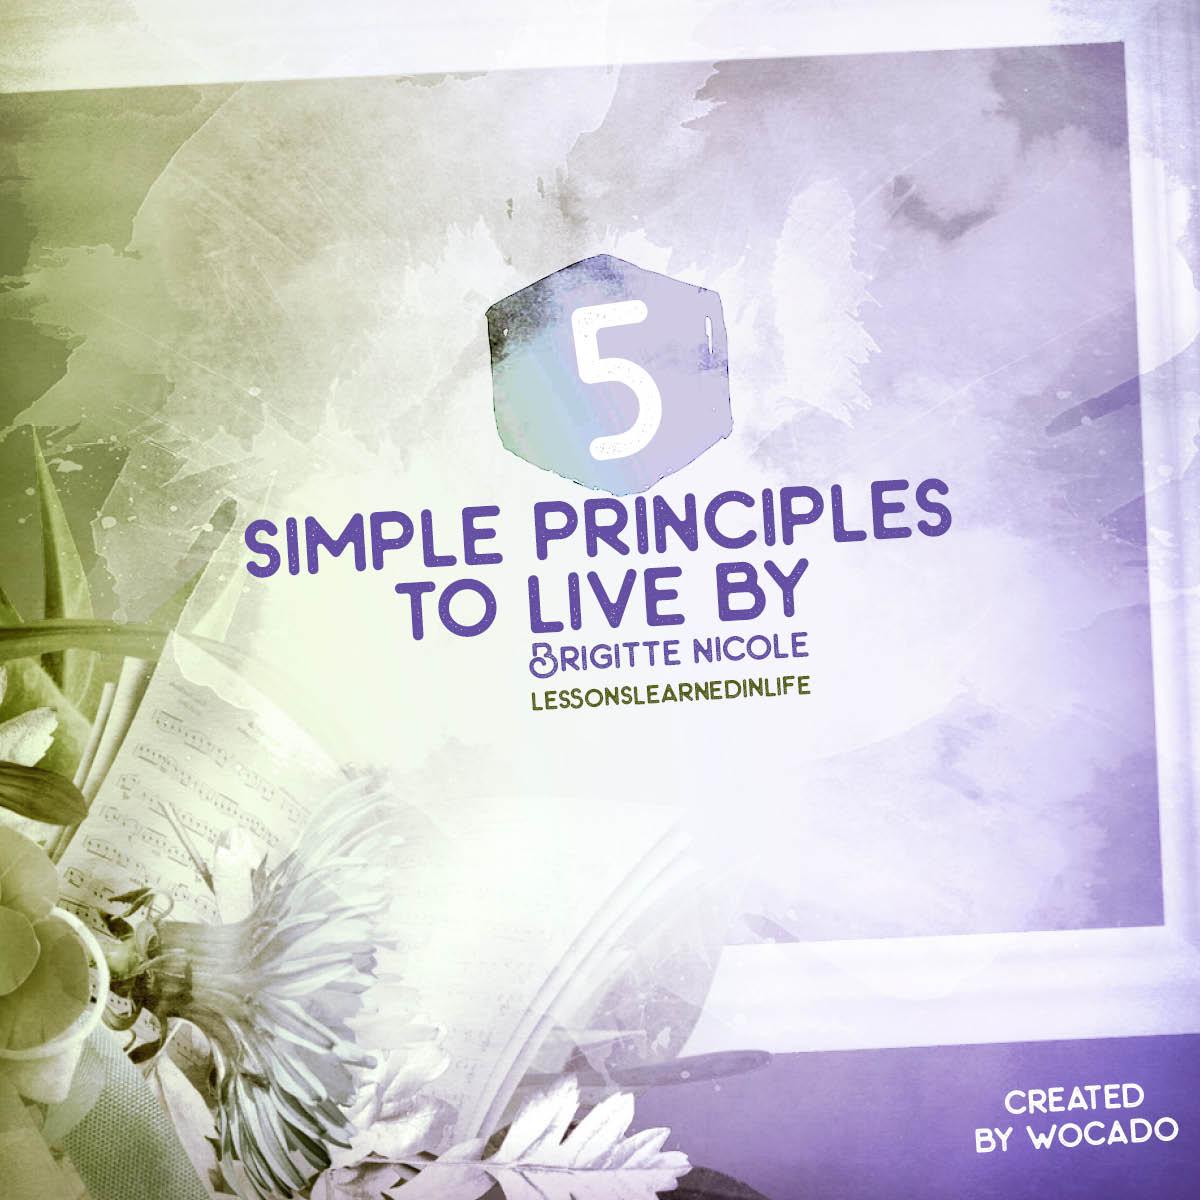 5 Simple Principles to Live By - Brigitte Nicole Video Quote by wocado